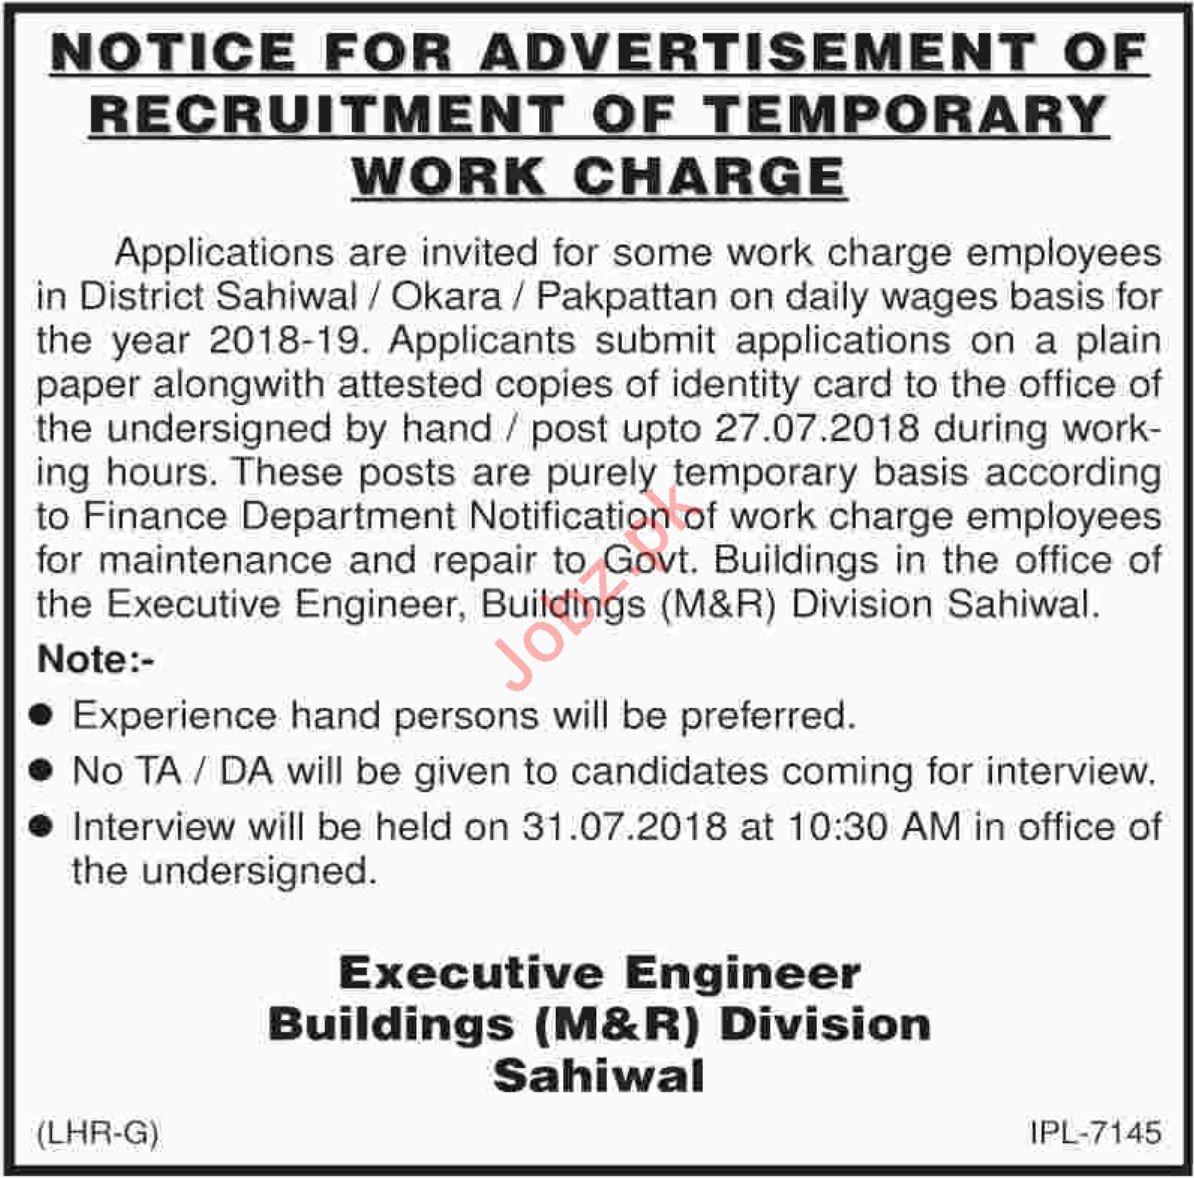 Executive Engineer Buildings M&R Division Sahiwal Jobs 2018